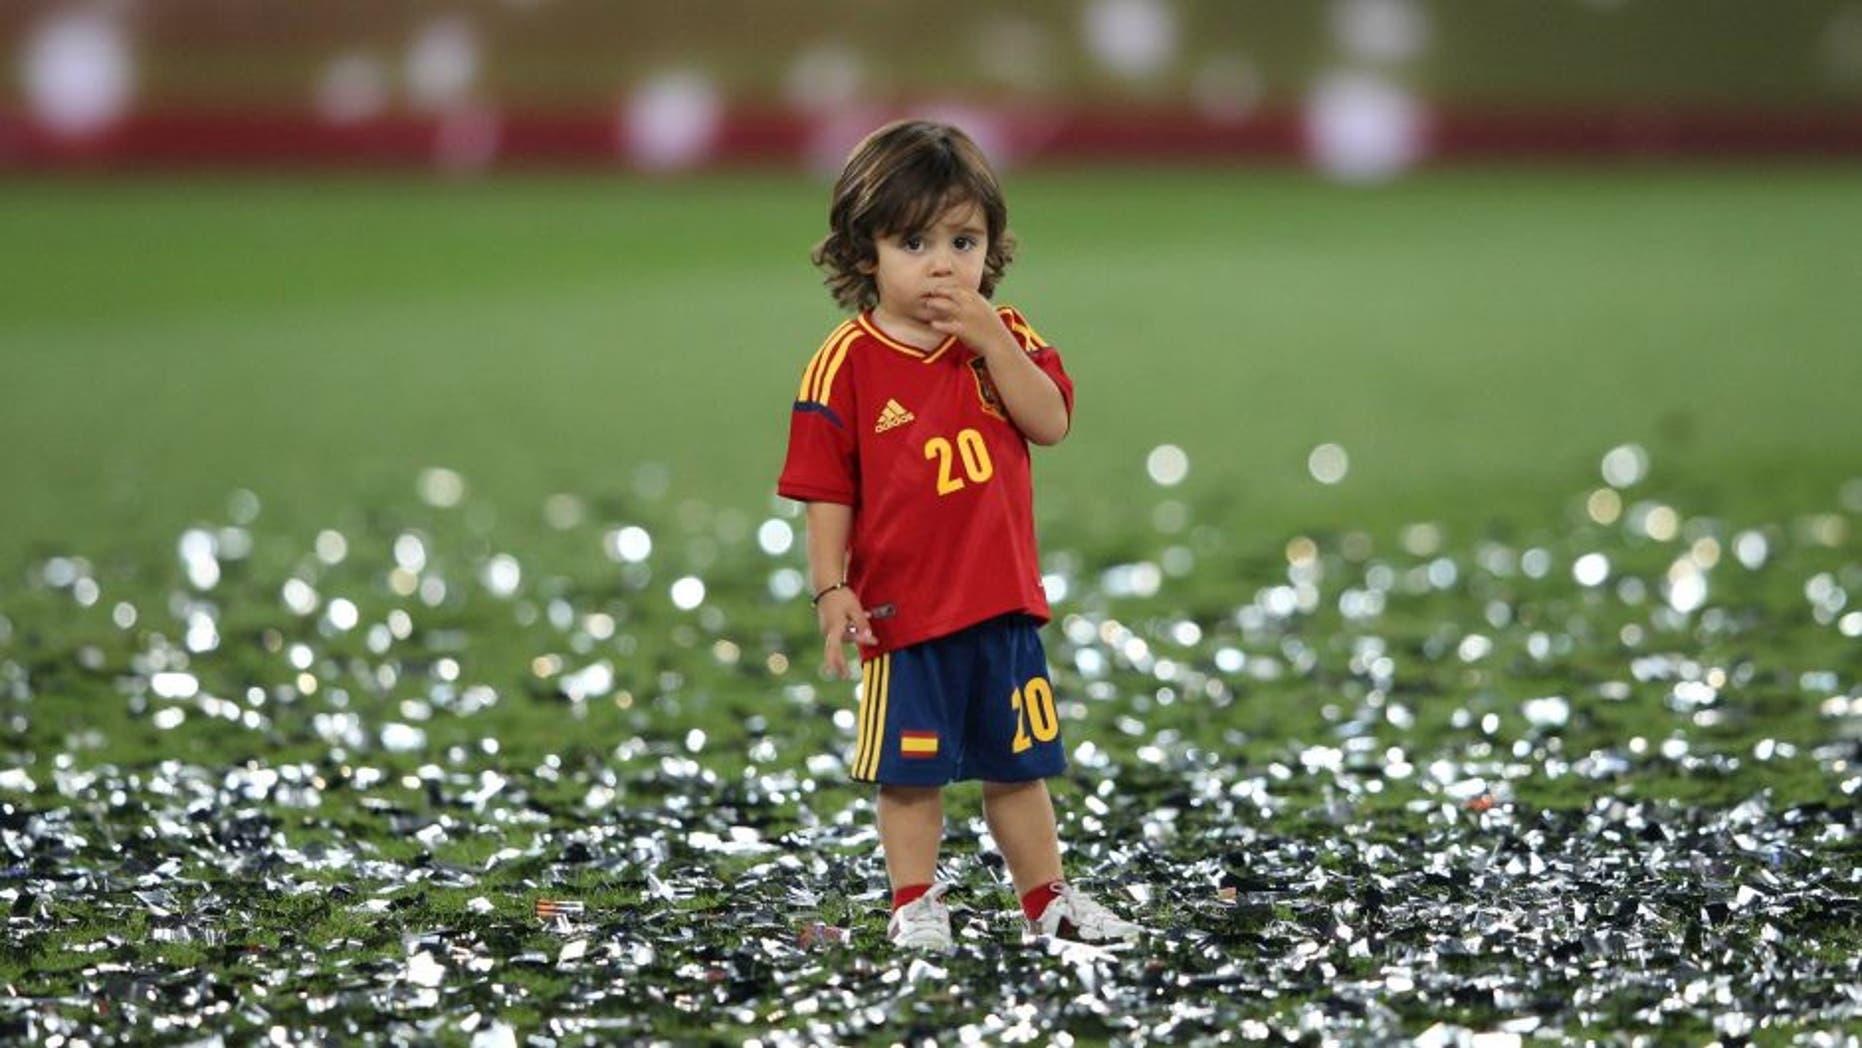 Football - Spain v Italy - UEFA EURO 2012 Final - Olympic Stadium, Kiev, Ukraine - 1/7/12 Spain's Santi Cazorla's son celebrates after the match Mandatory Credit: Action Images / Carl Recine Livepic